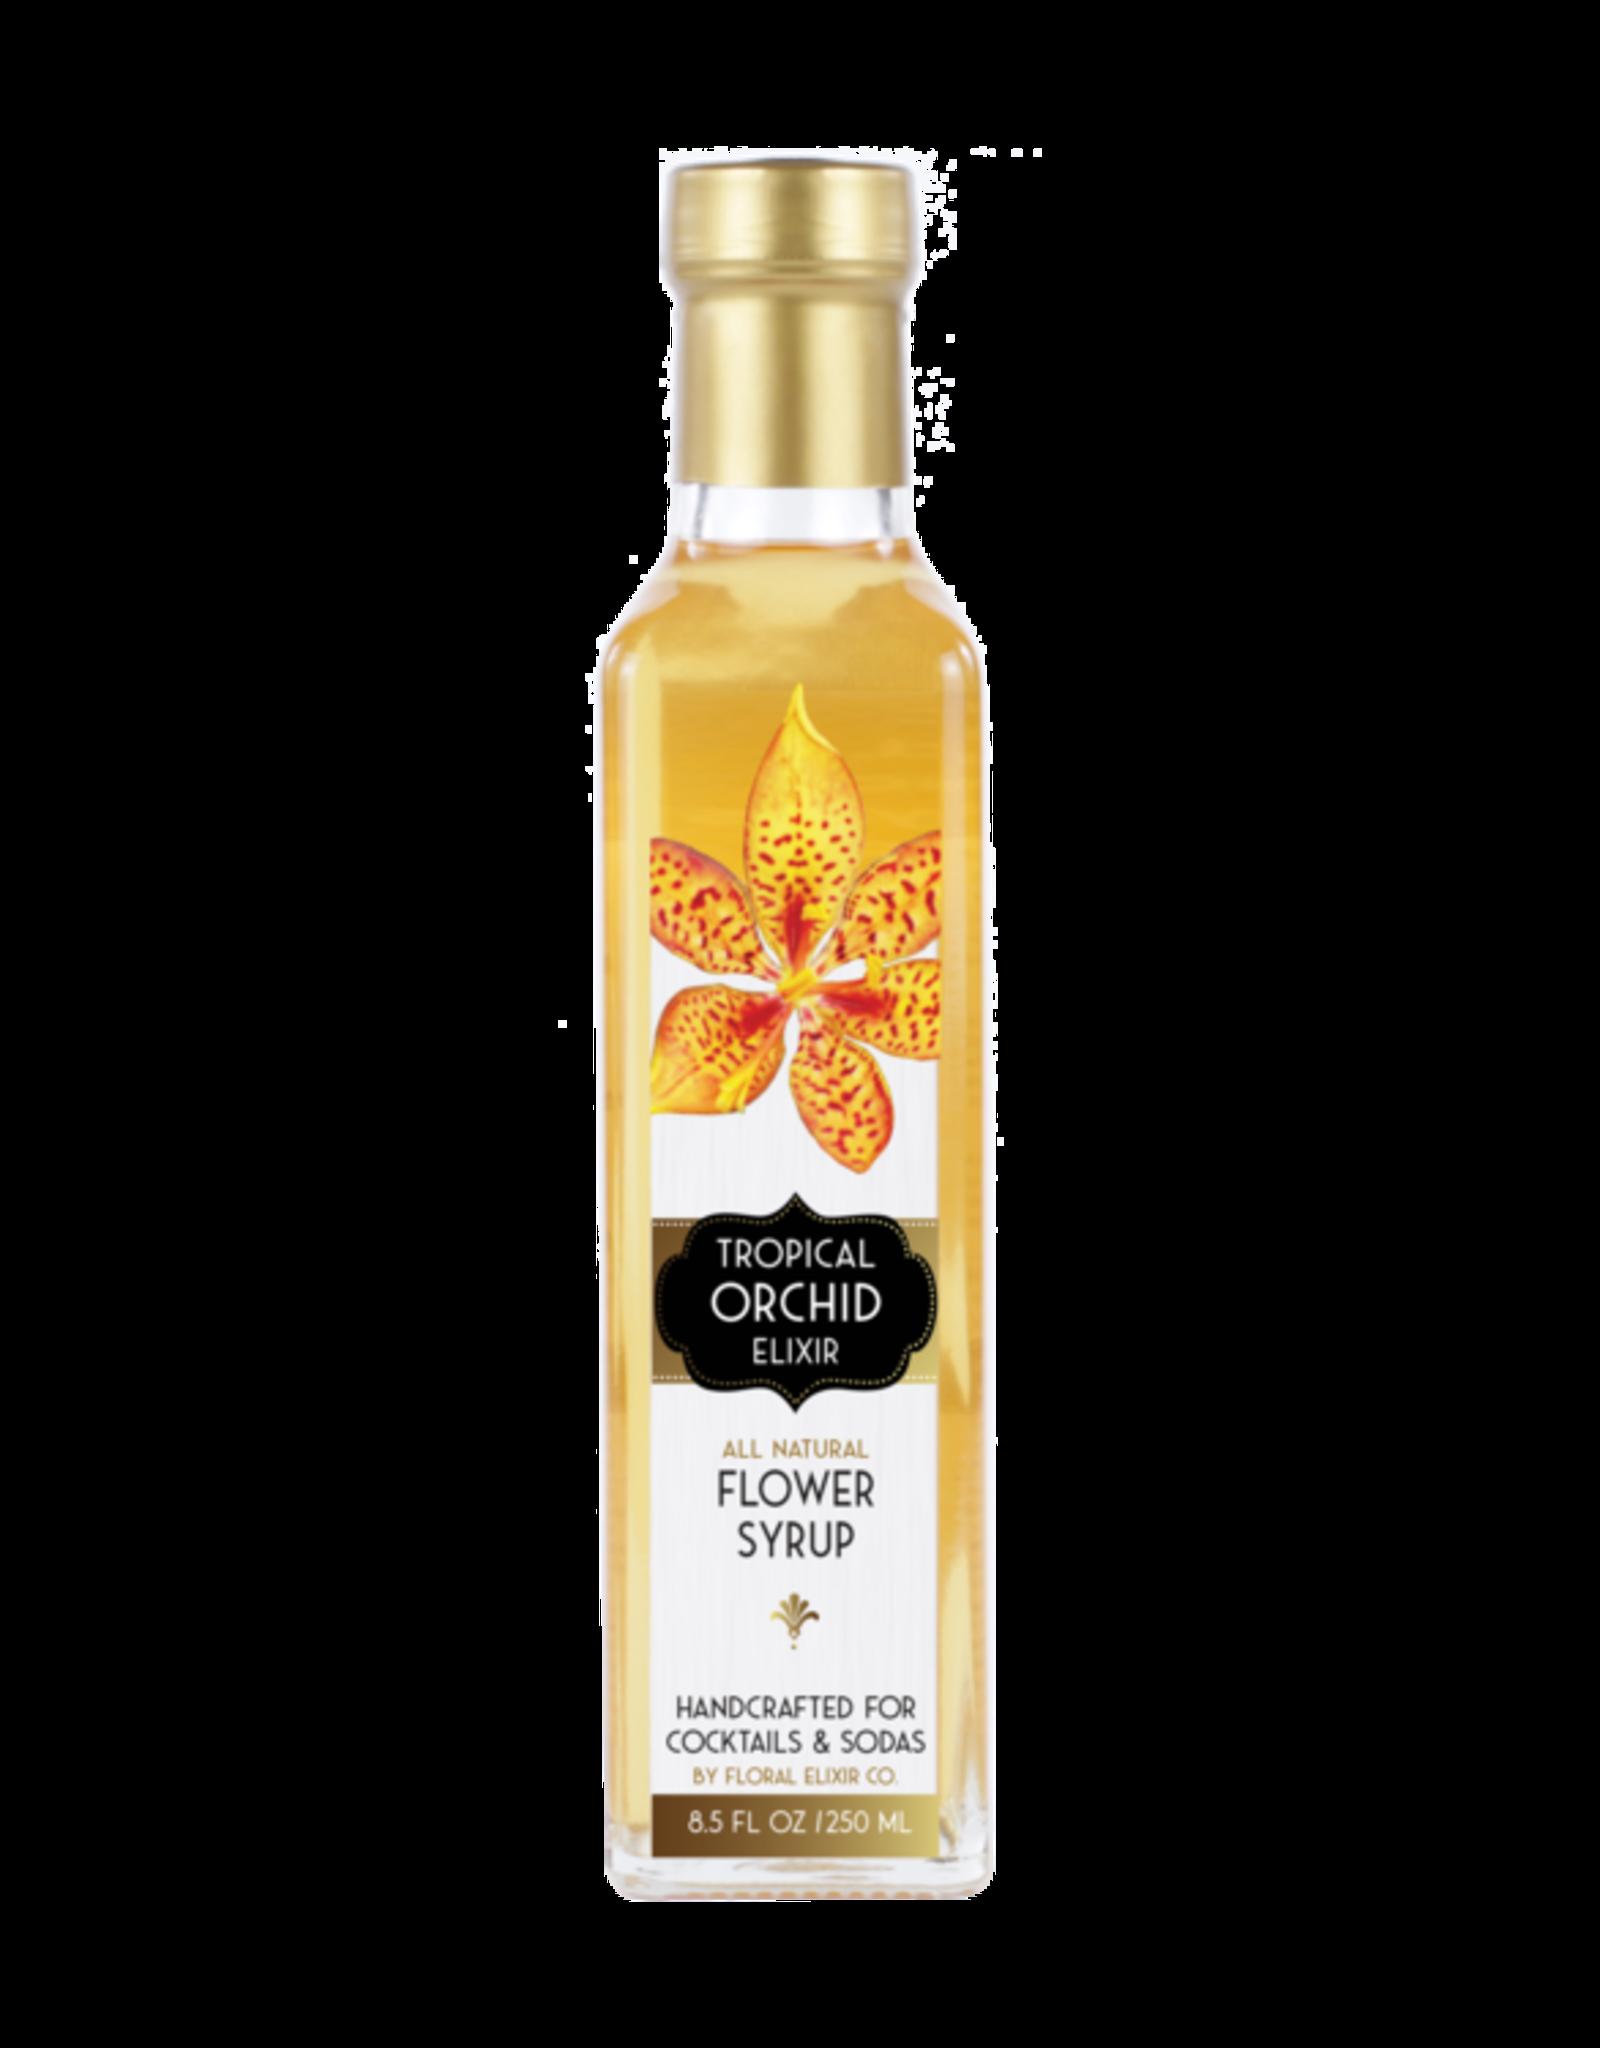 Floral Elixir Company Tropical Orchid Elixir